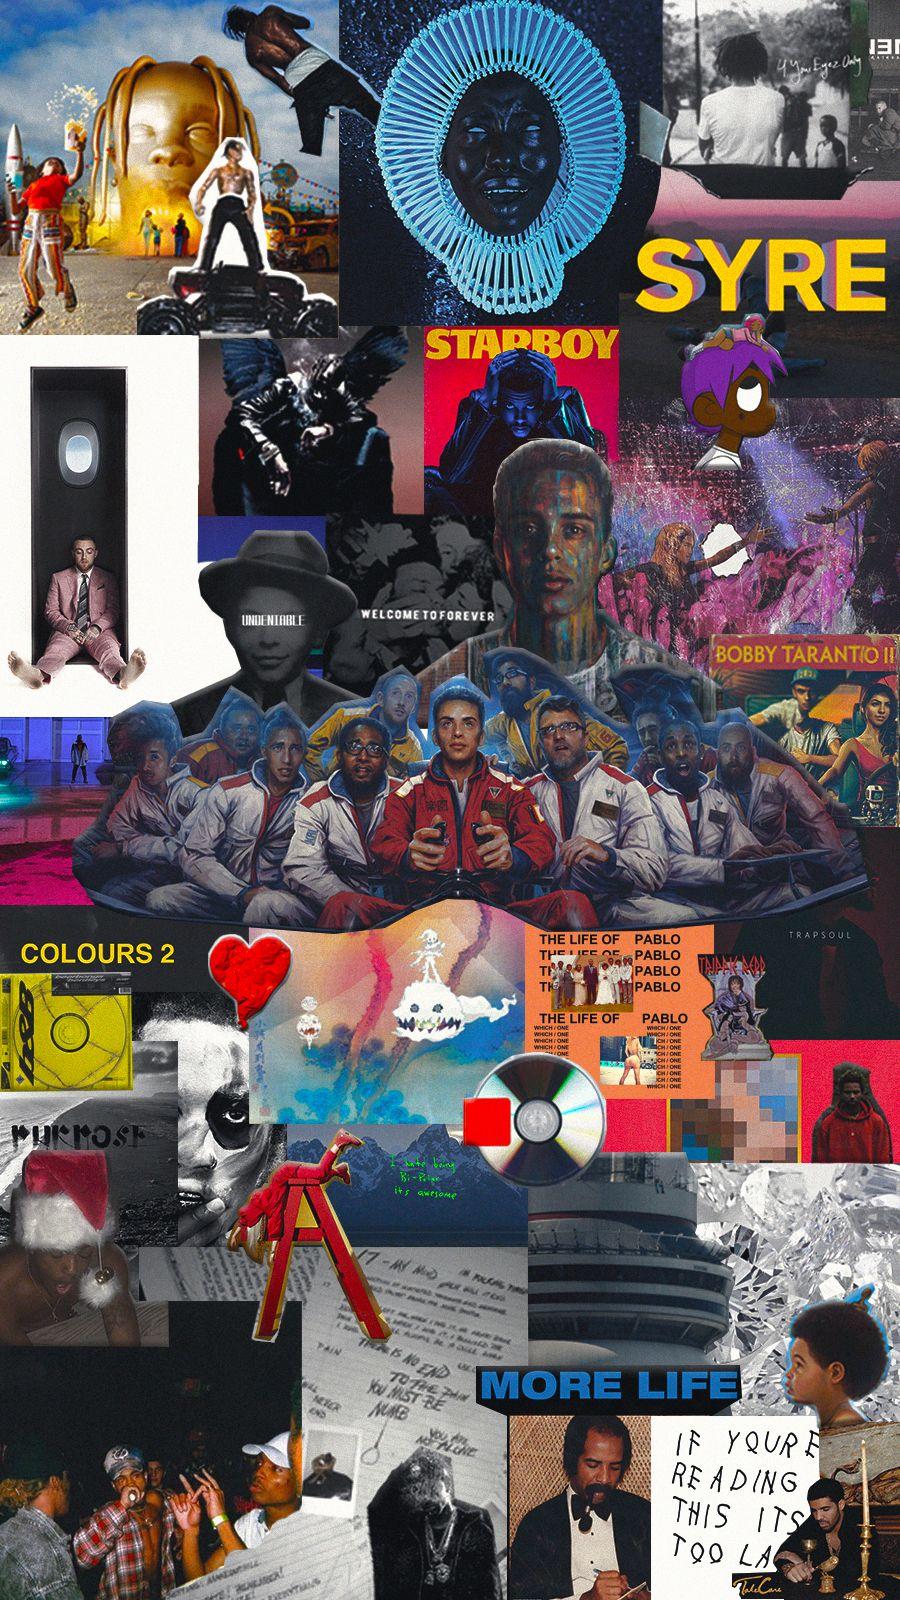 45 albums combined wallpaper